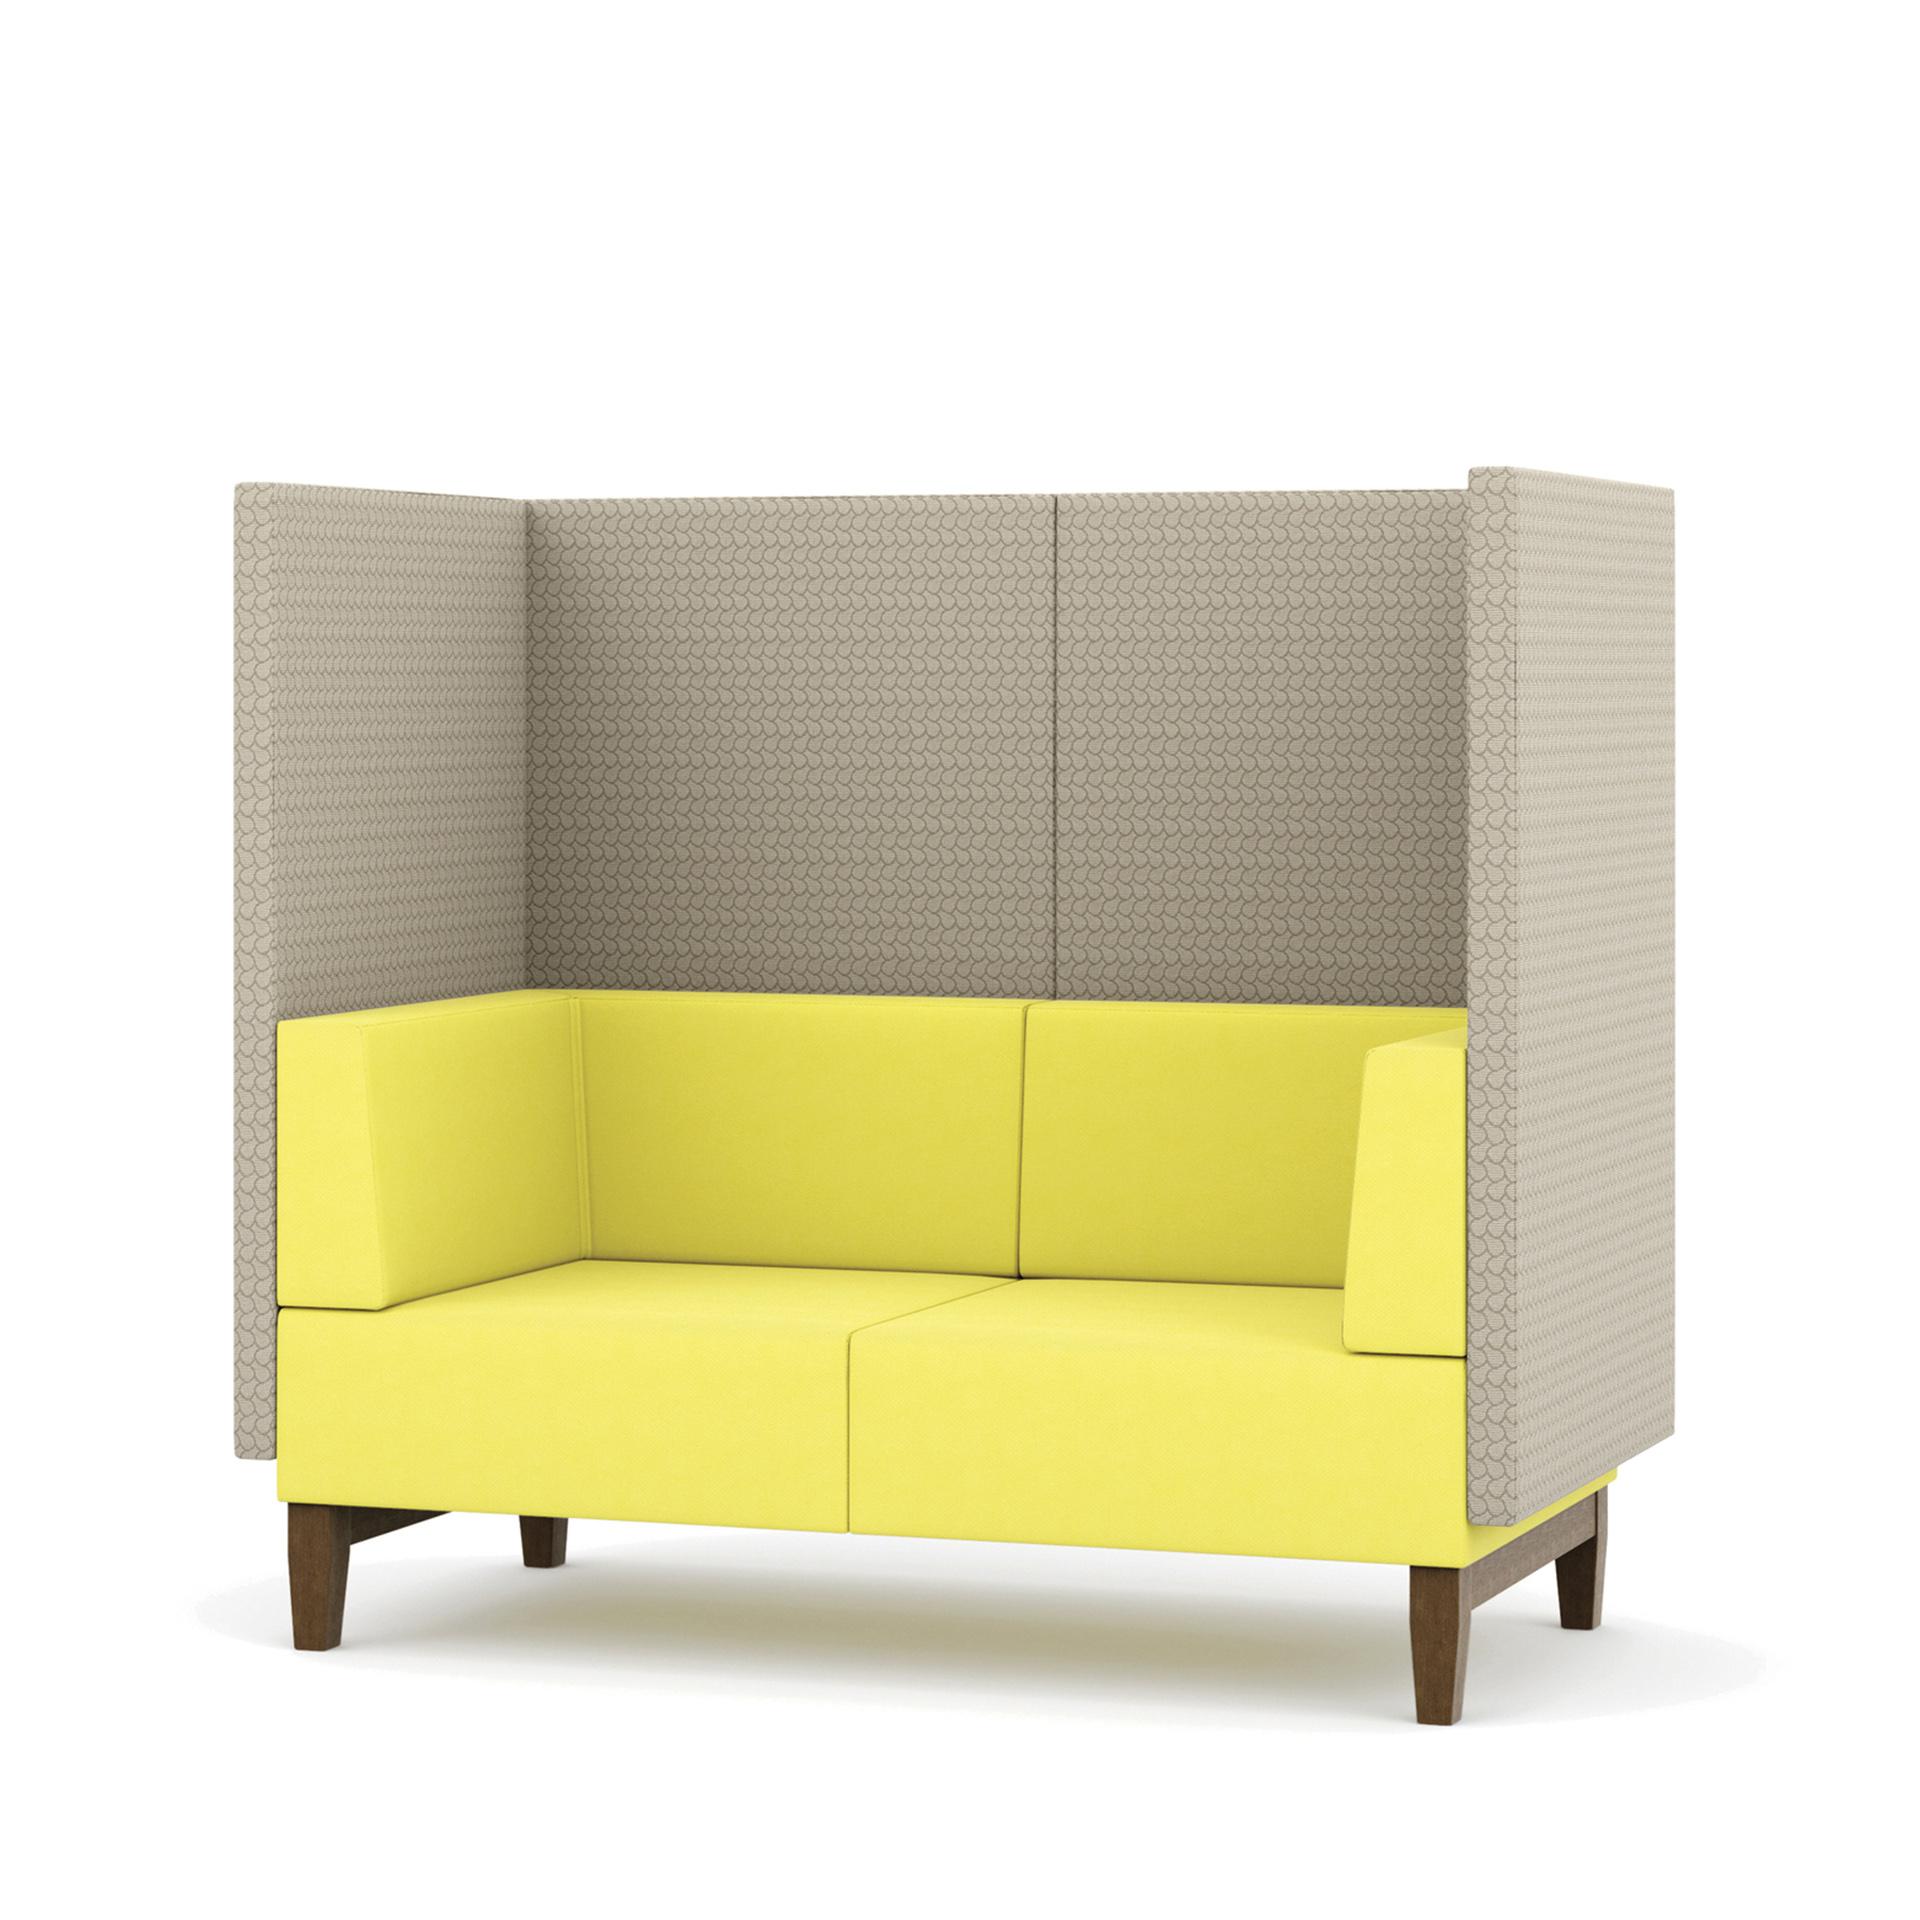 Breakout Furniture Double Seat